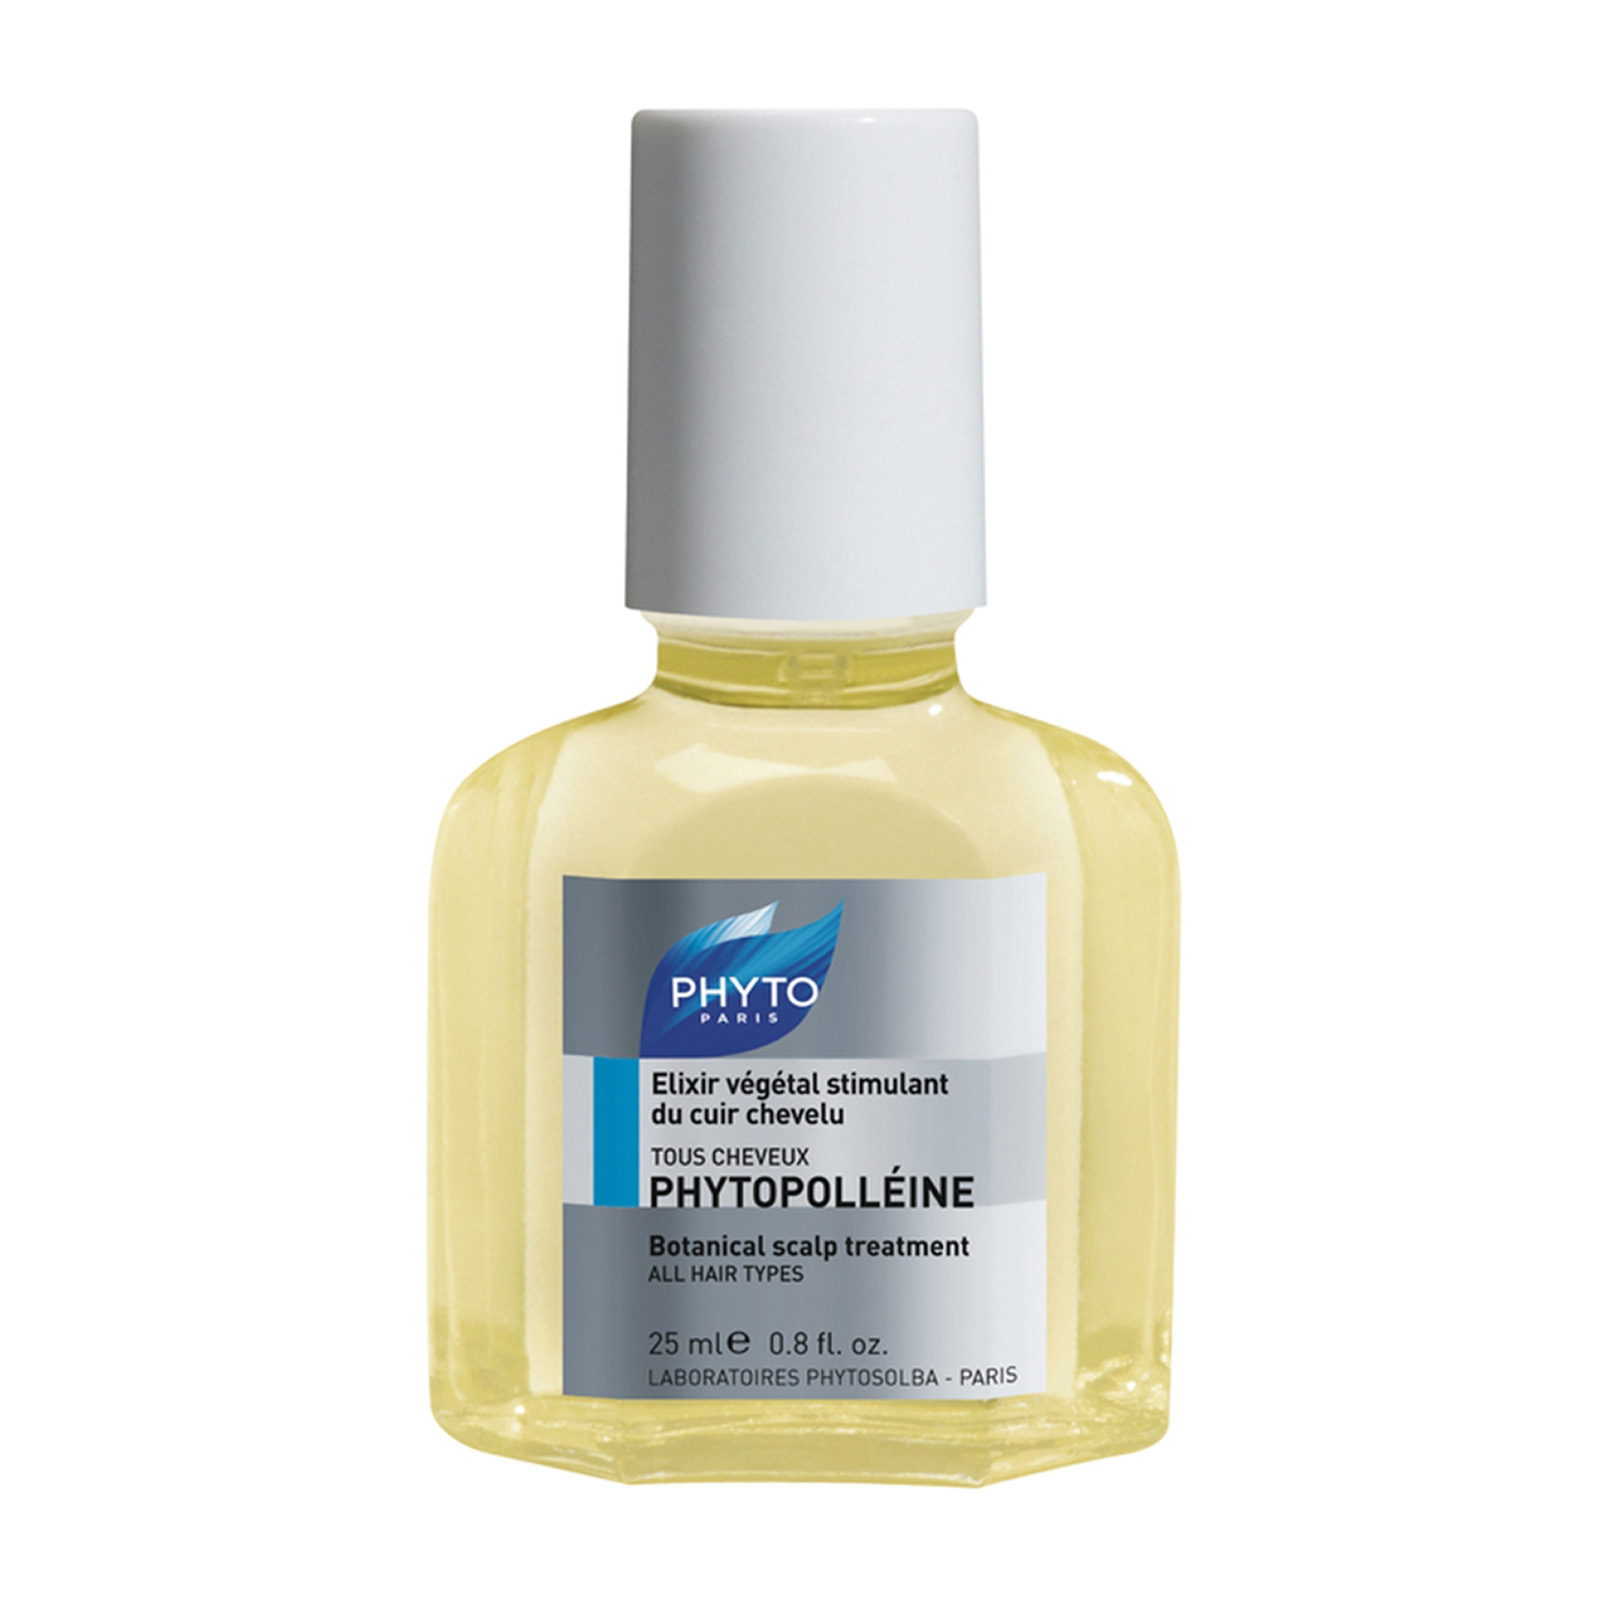 Phyto Phytopolleine Botanical Pre-Shampoo Scalp Stimulating Treatment 25ml